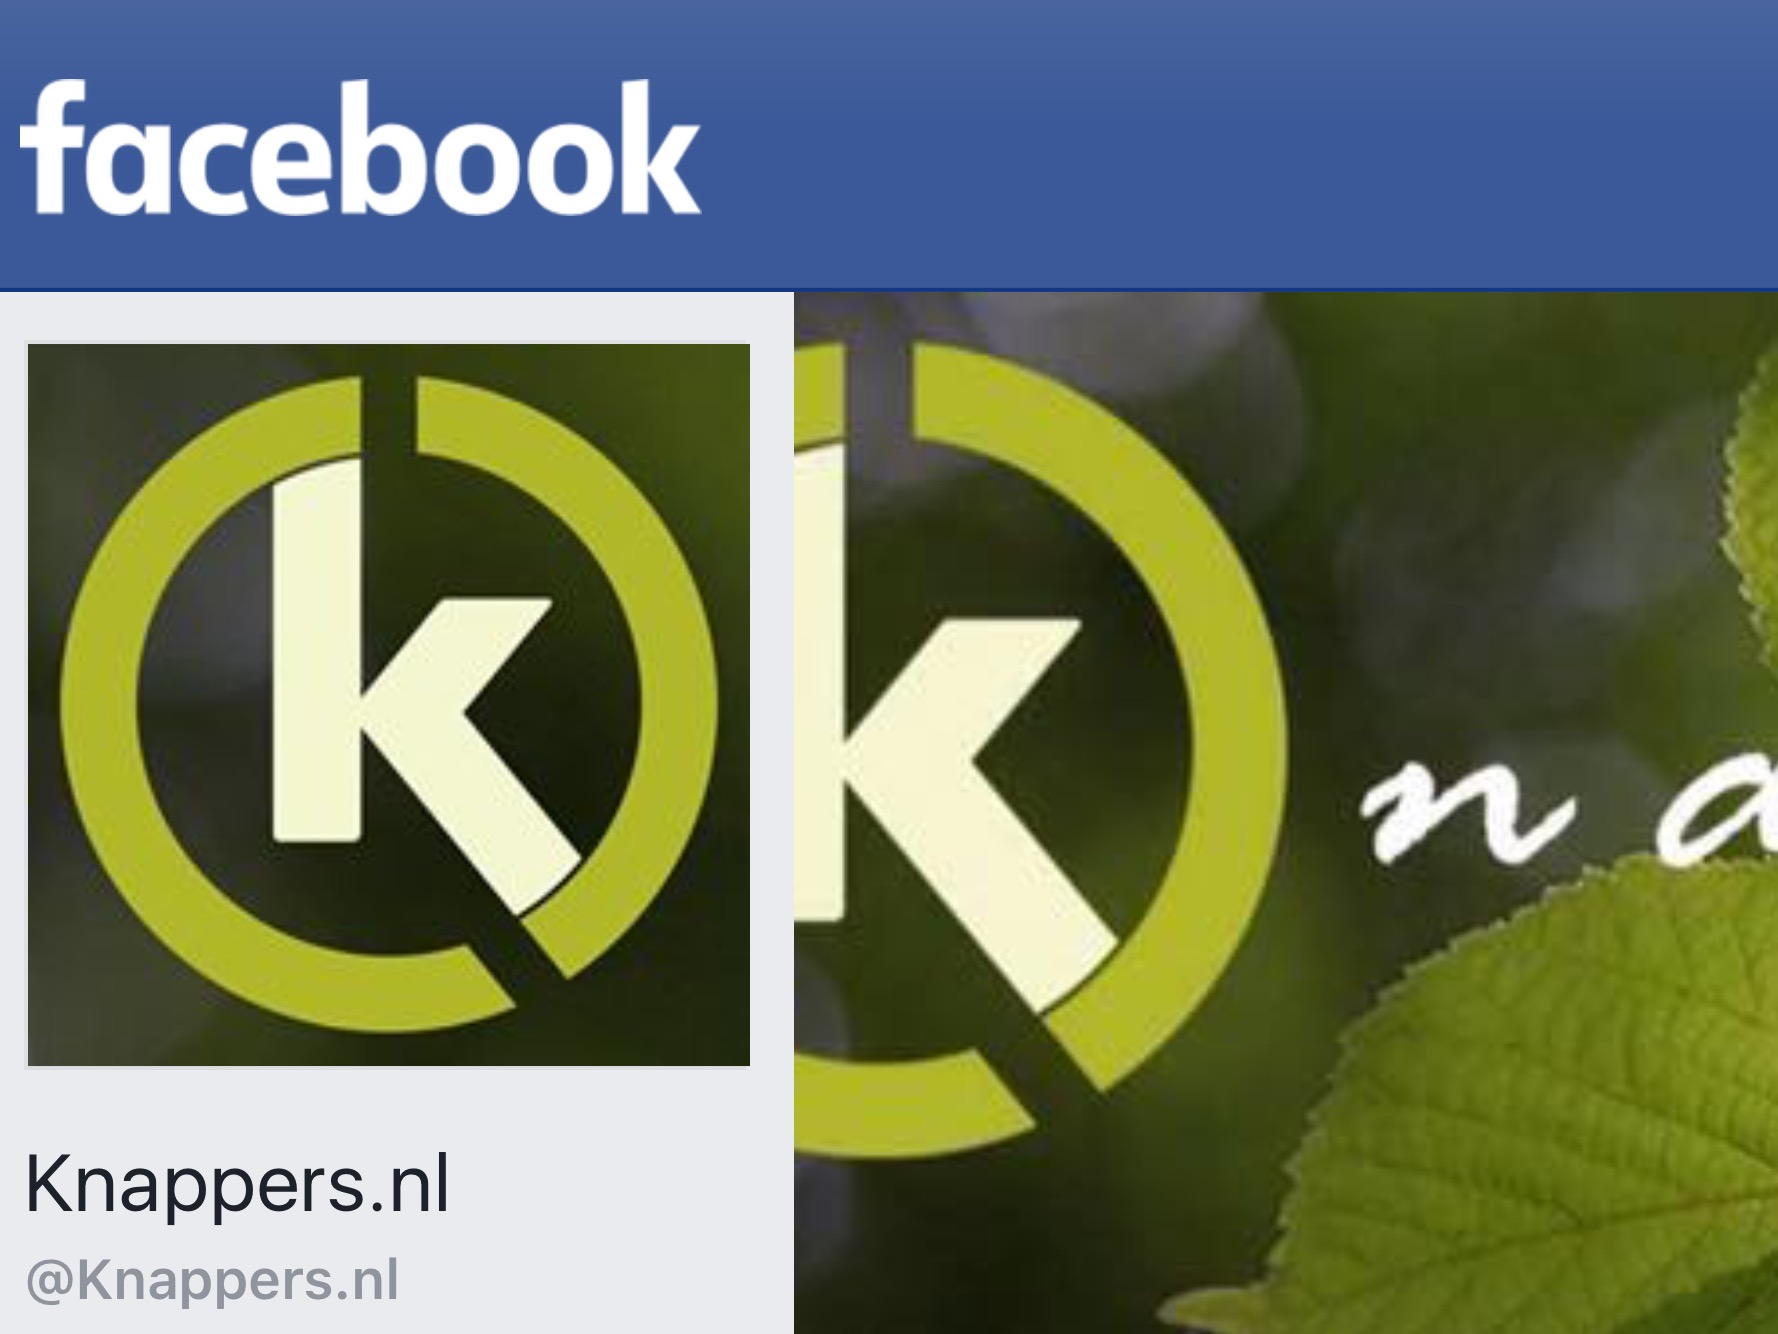 Knappers.nl op Facebook